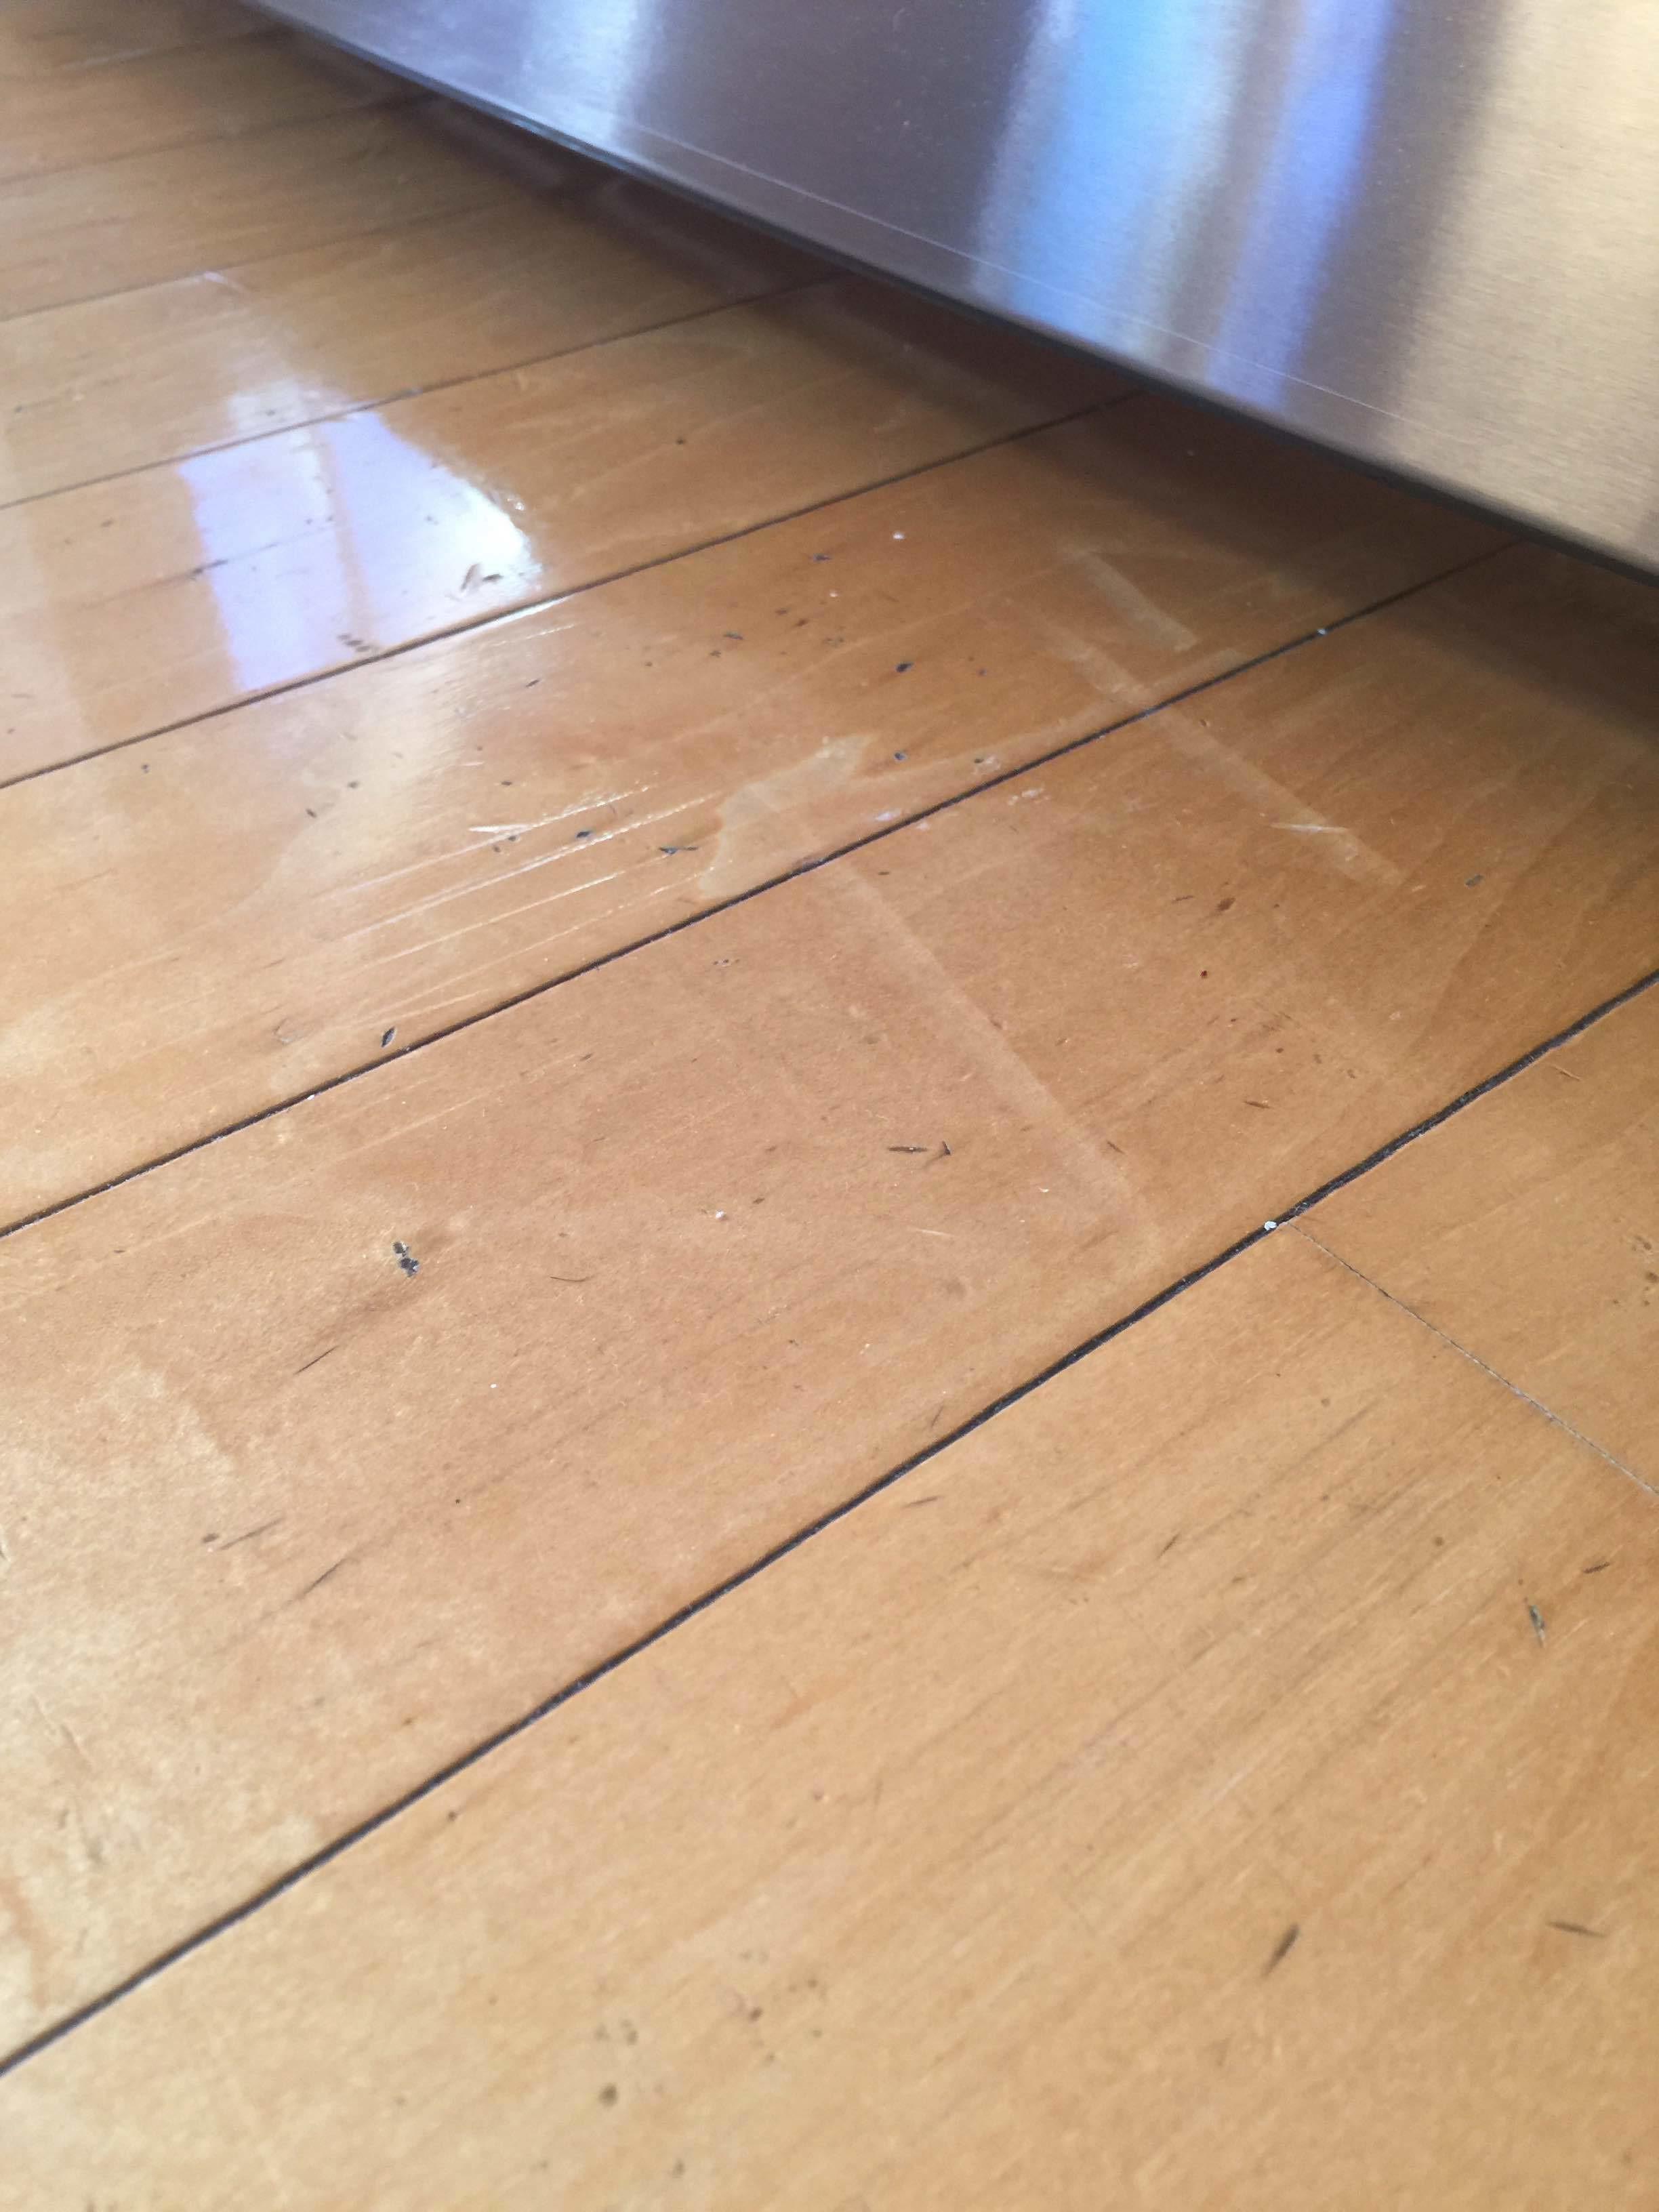 costco hardwood floor installation of costco shaw flooring reviews floor shaw laminate flooring reviews with regard to costco shaw flooring reviews floor shaw laminate flooring reviews